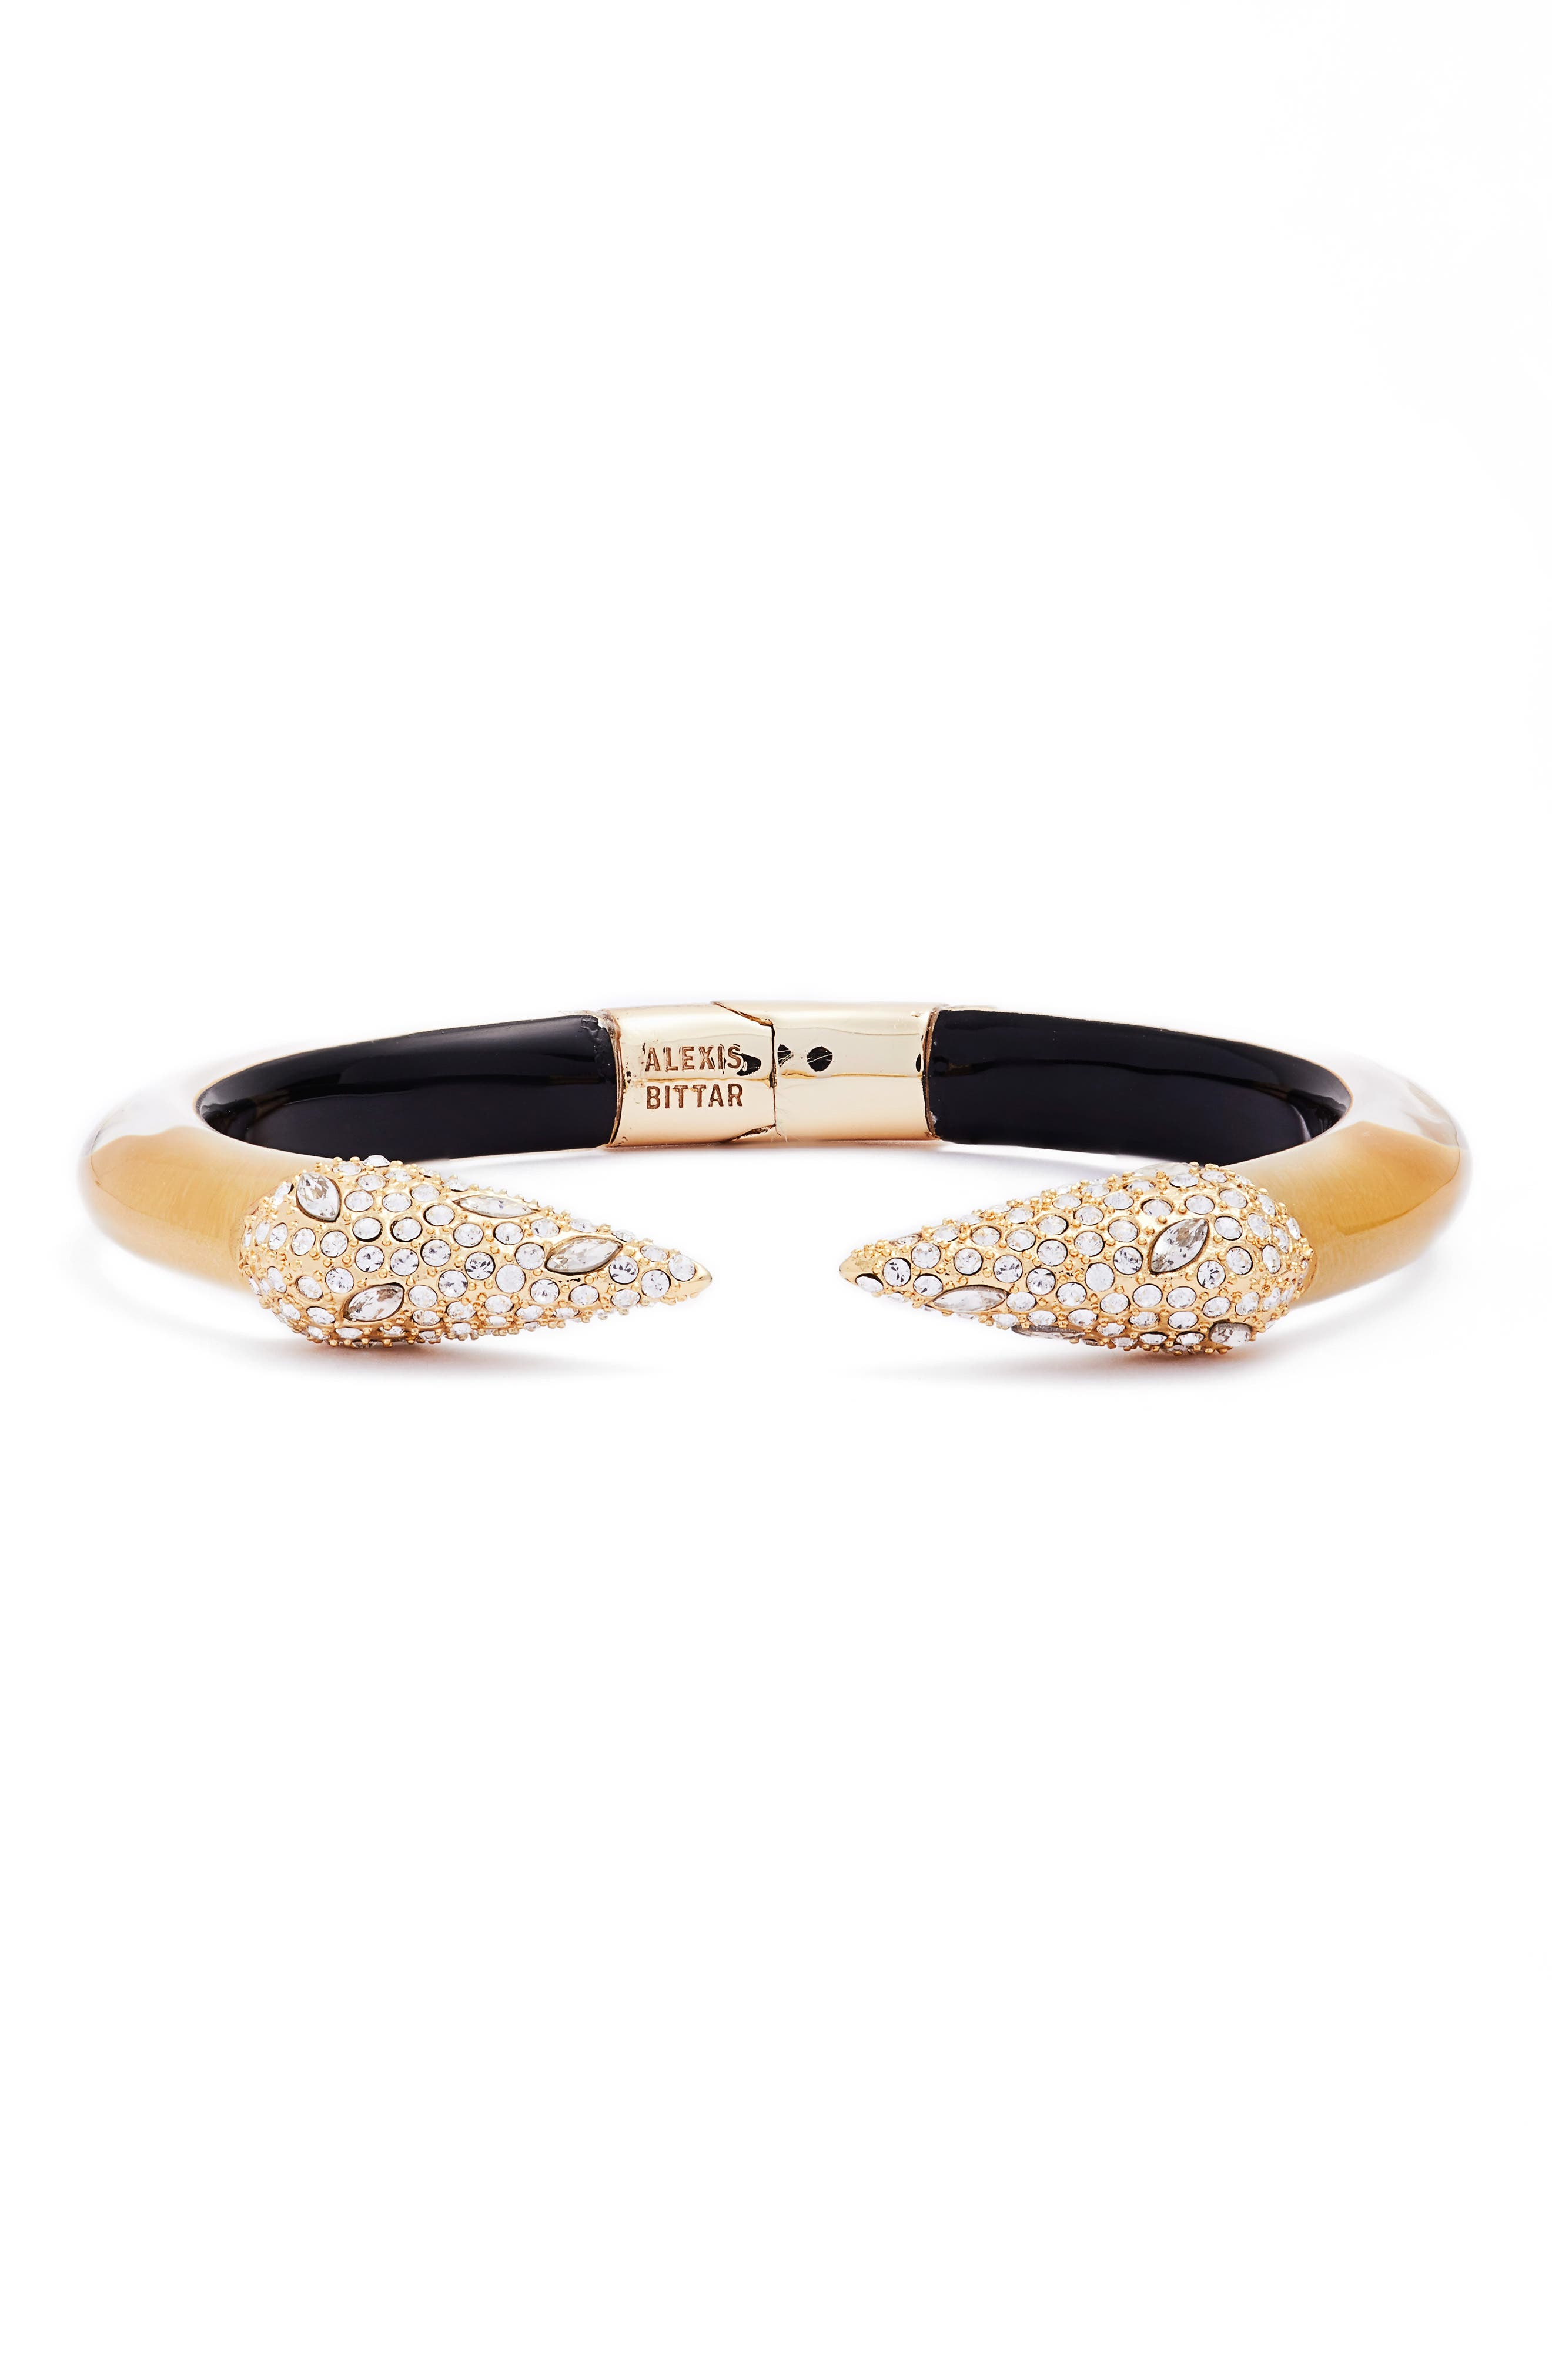 Main Image - Alexis Bittar Encrusted Hinge Bracelet